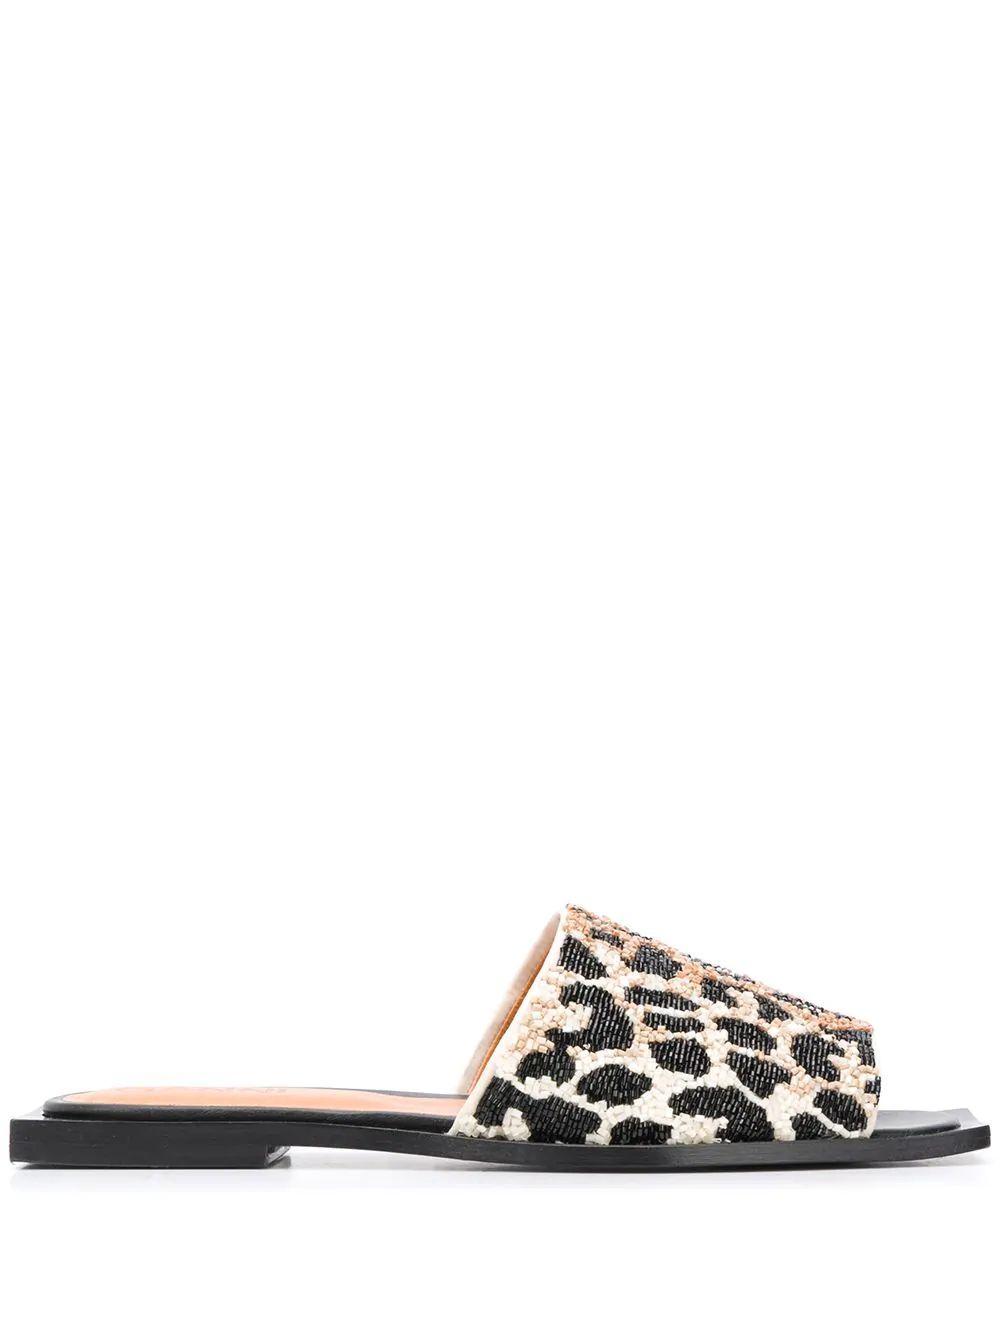 Leopard Square Toe Slide Sandal Item # S1193